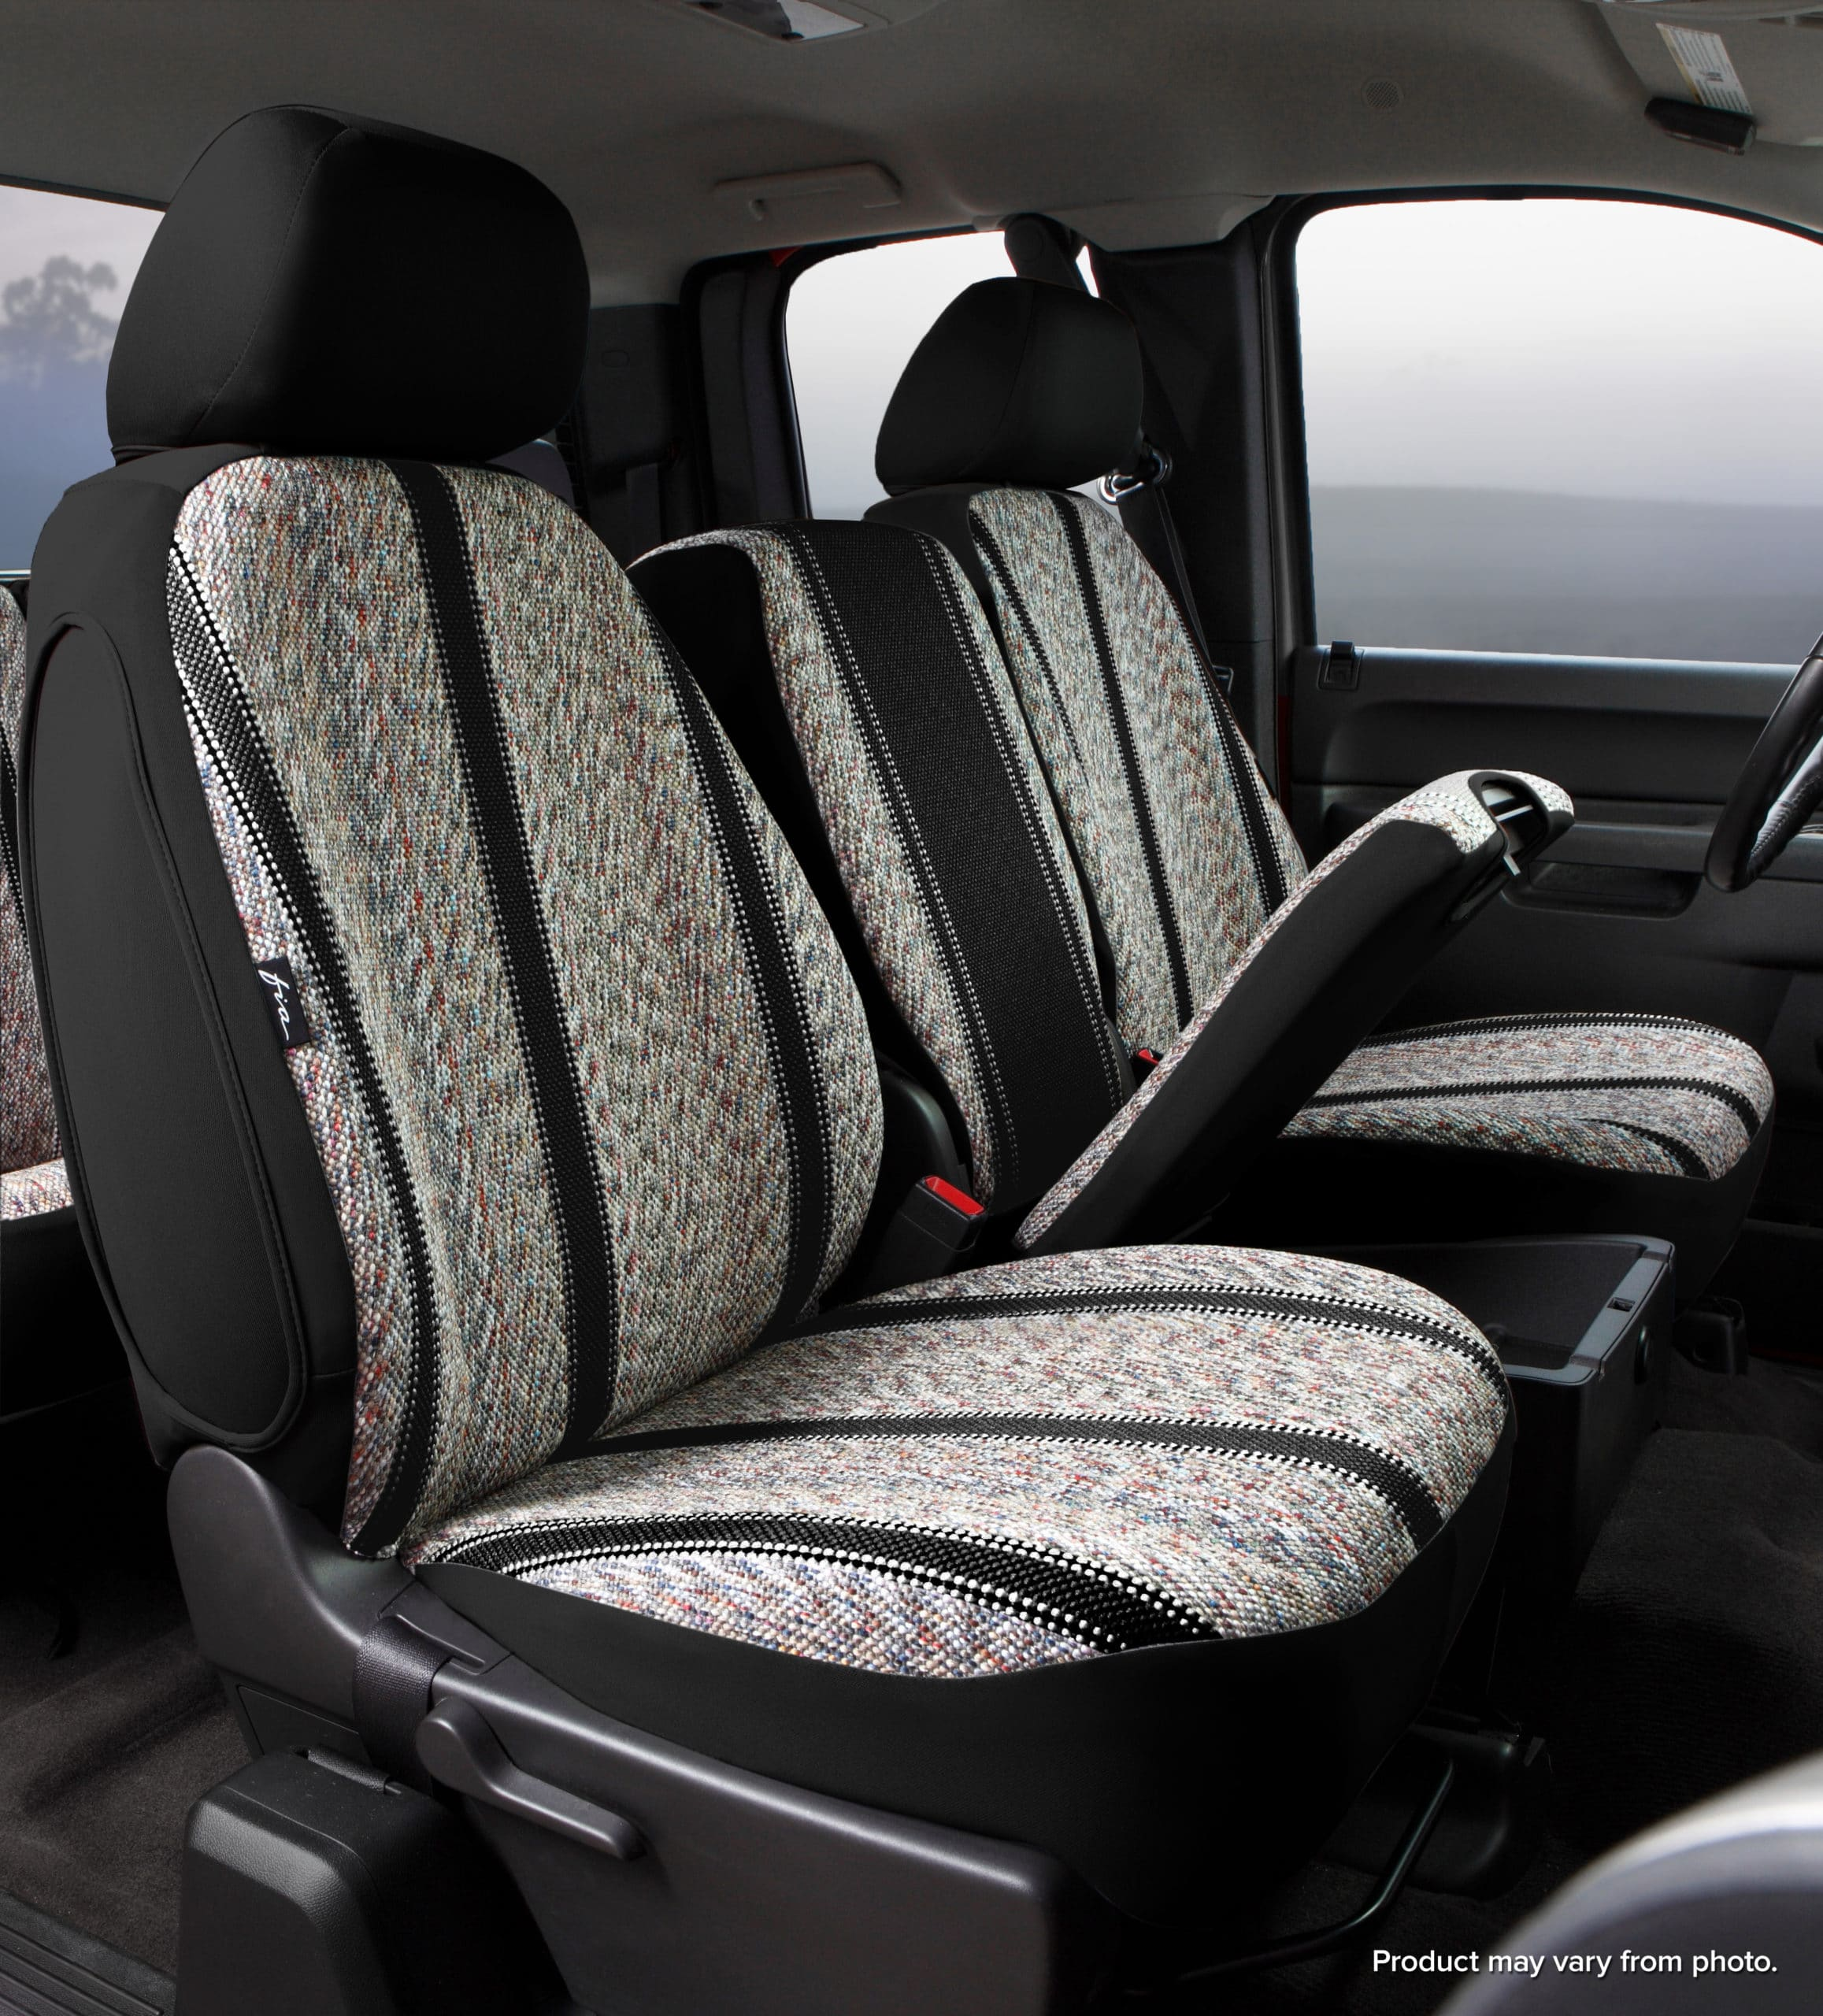 Fia Original Wrangler Seat Covers - Black - Front Seats